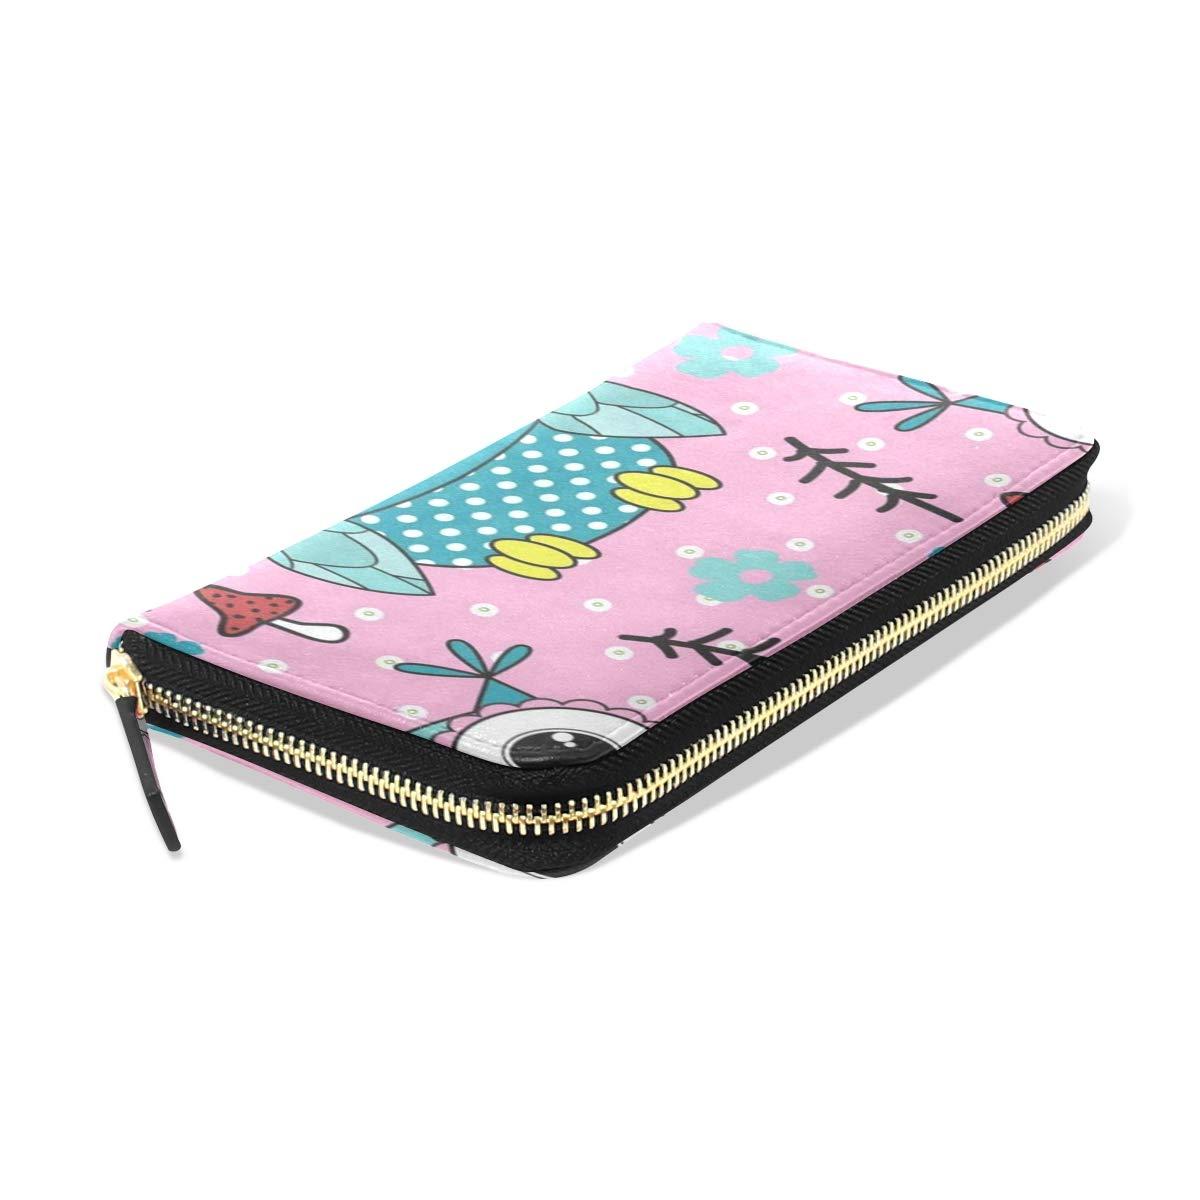 Womens Wallets Cartoon Owl Mushroom Floral Print Leather Passport Wallet Coin Purse Girls Handbags